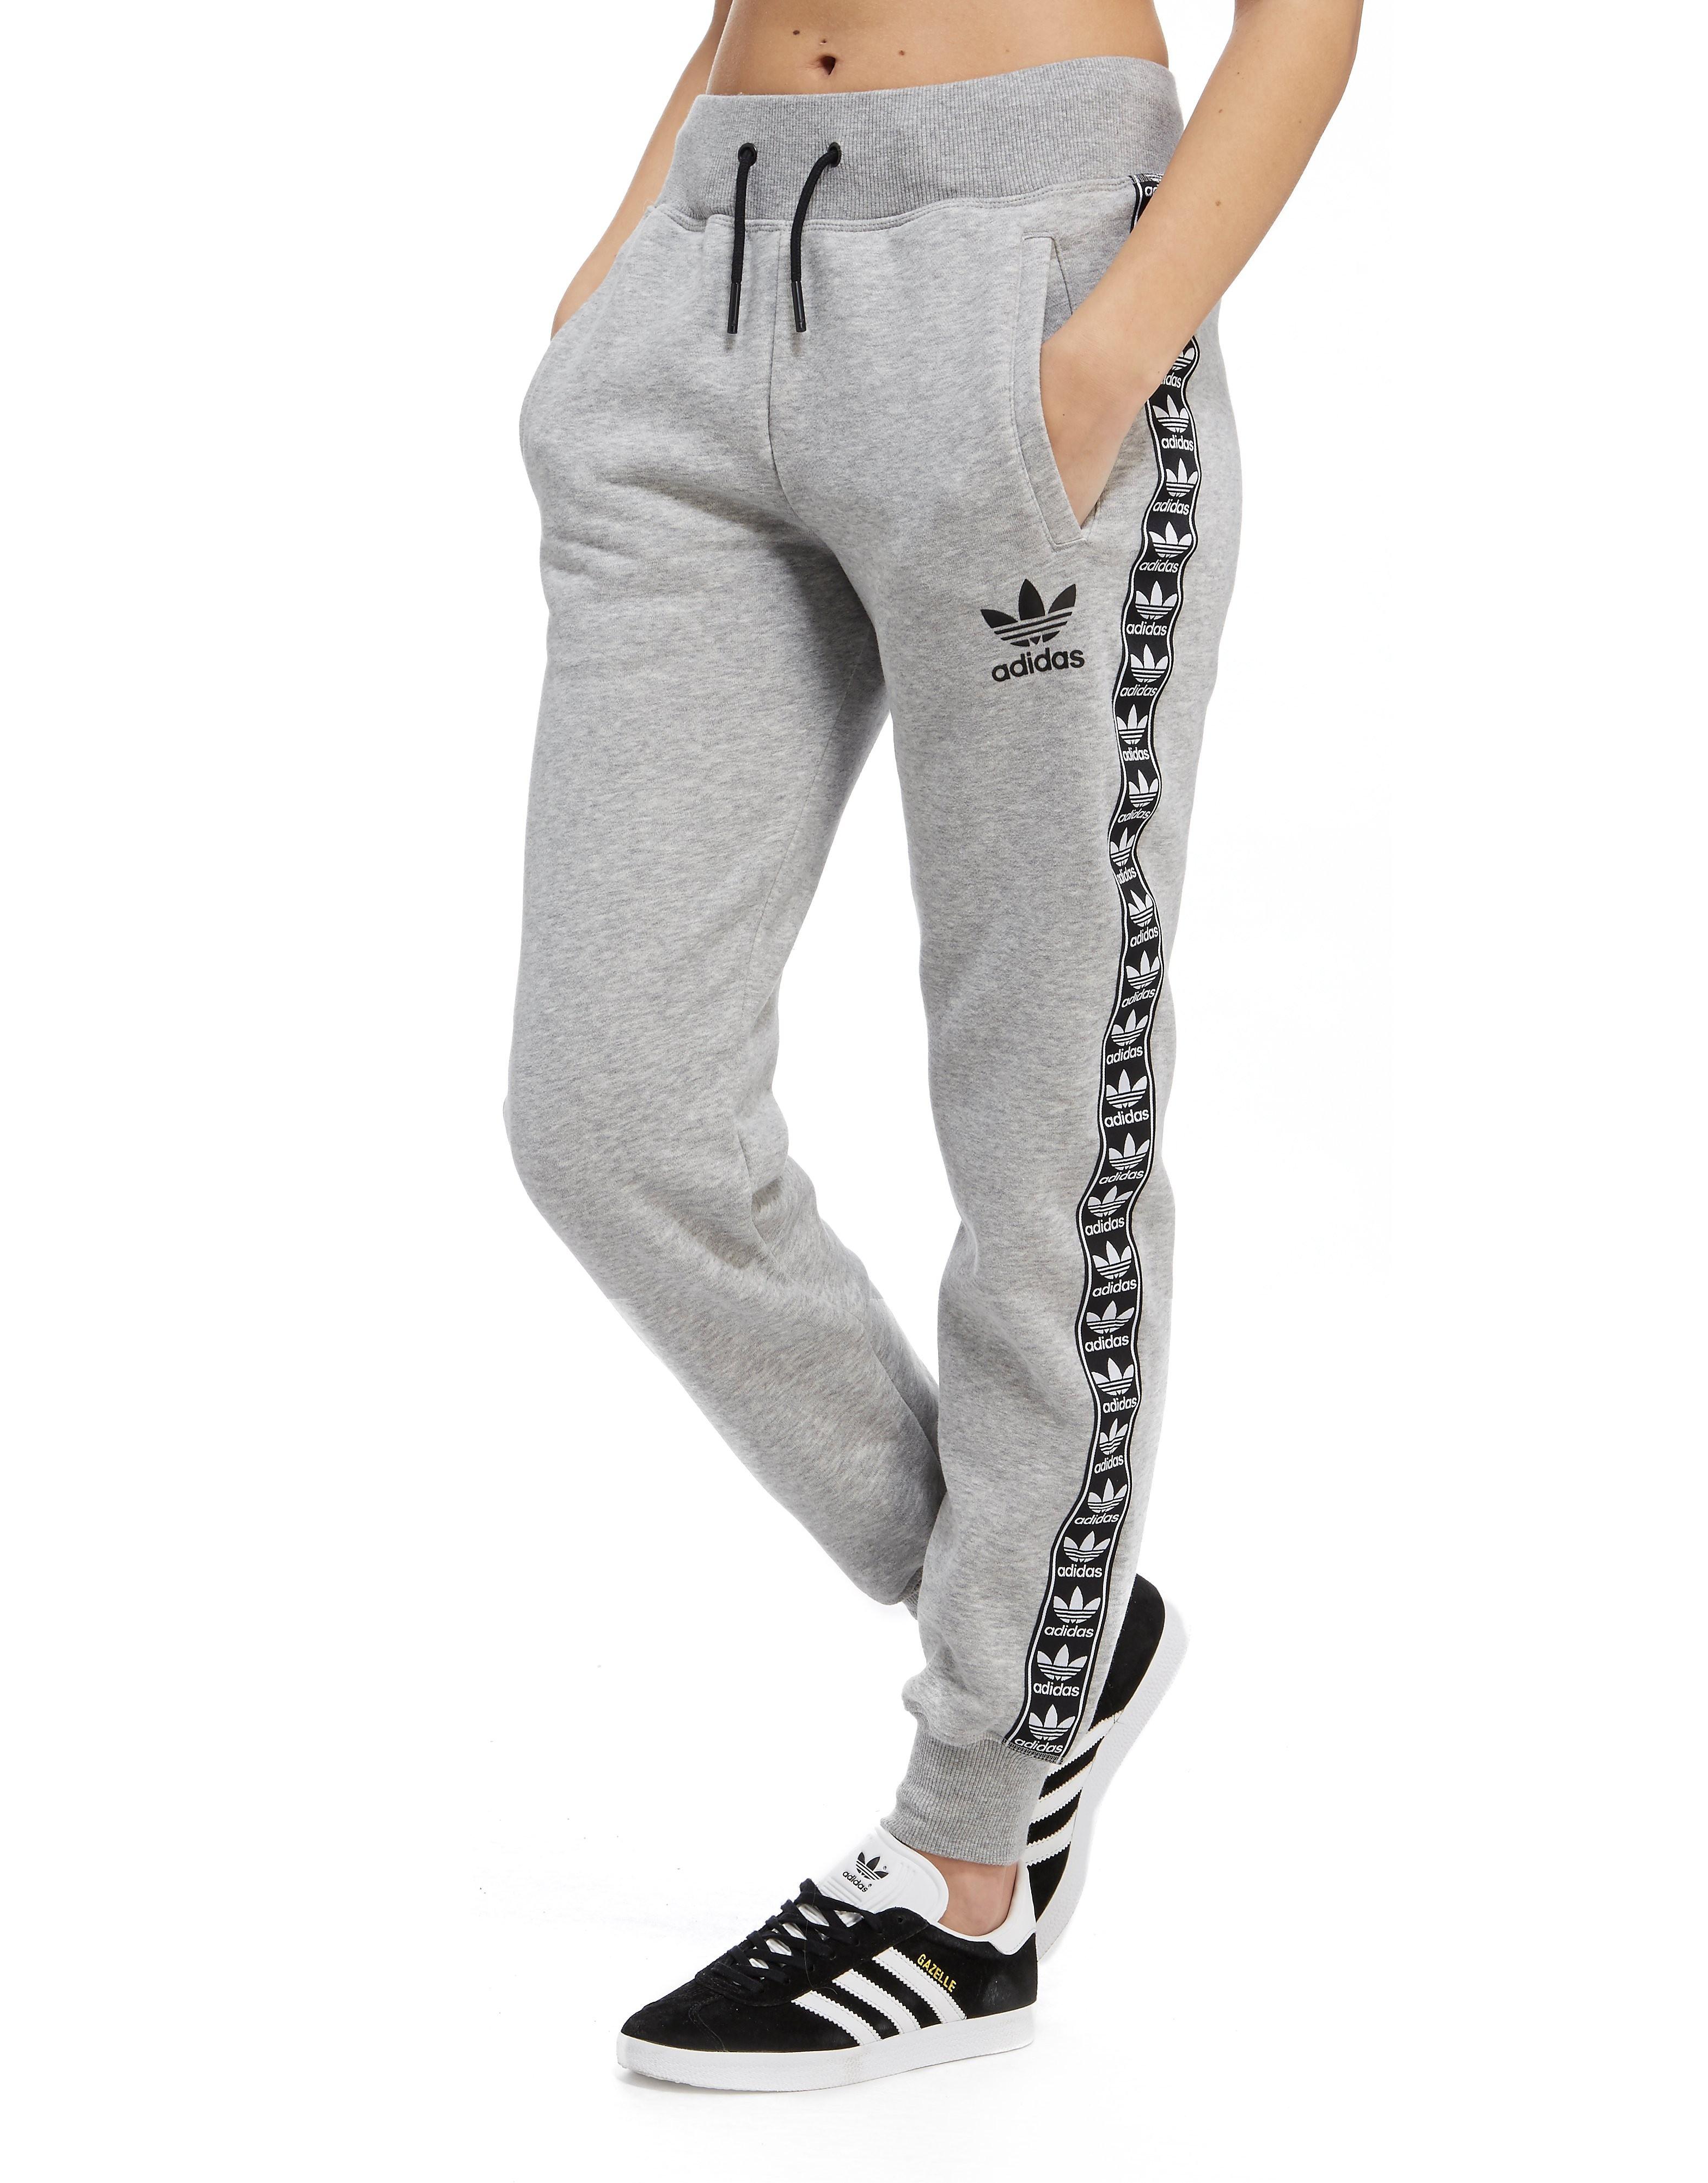 adidas Originals Tape Fleece Pants